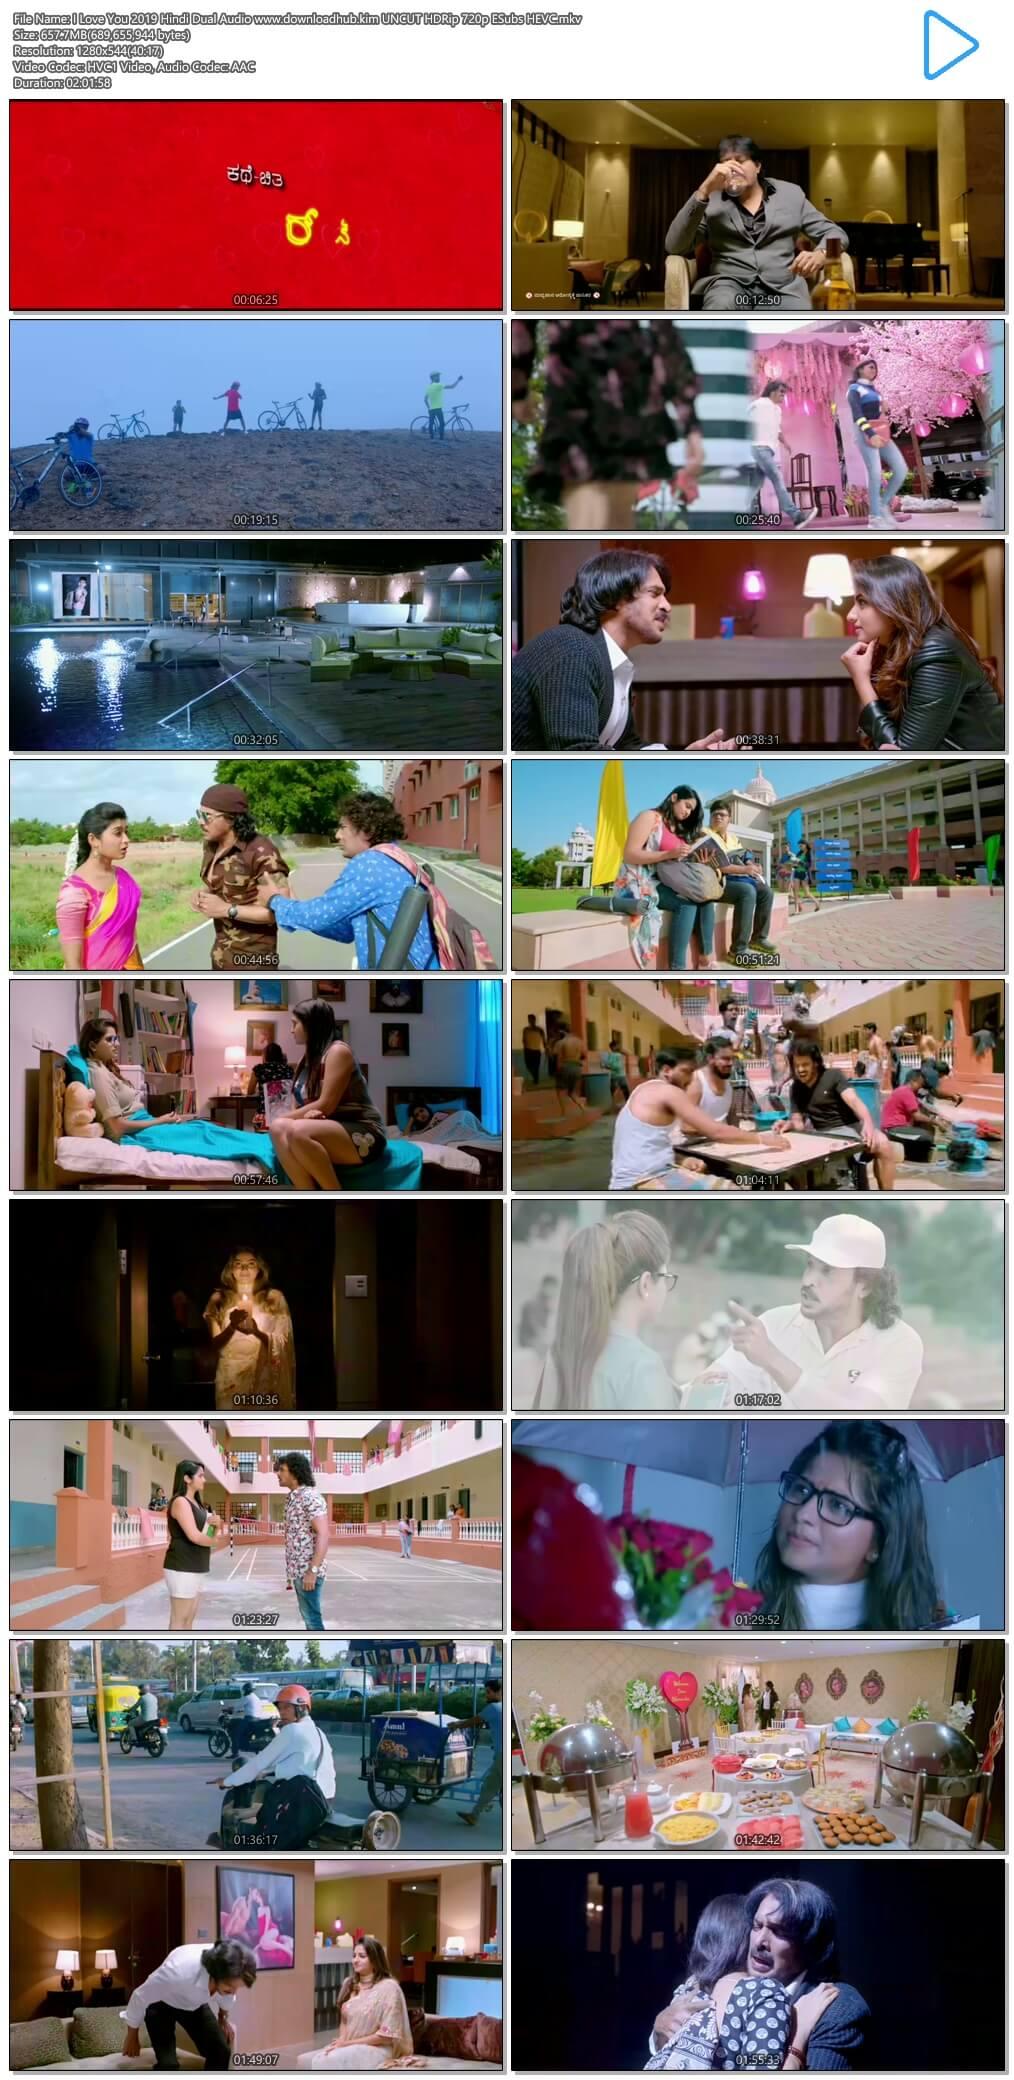 I Love You 2019 Hindi Dual Audio 650MB UNCUT HDRip 720p ESubs HEVC